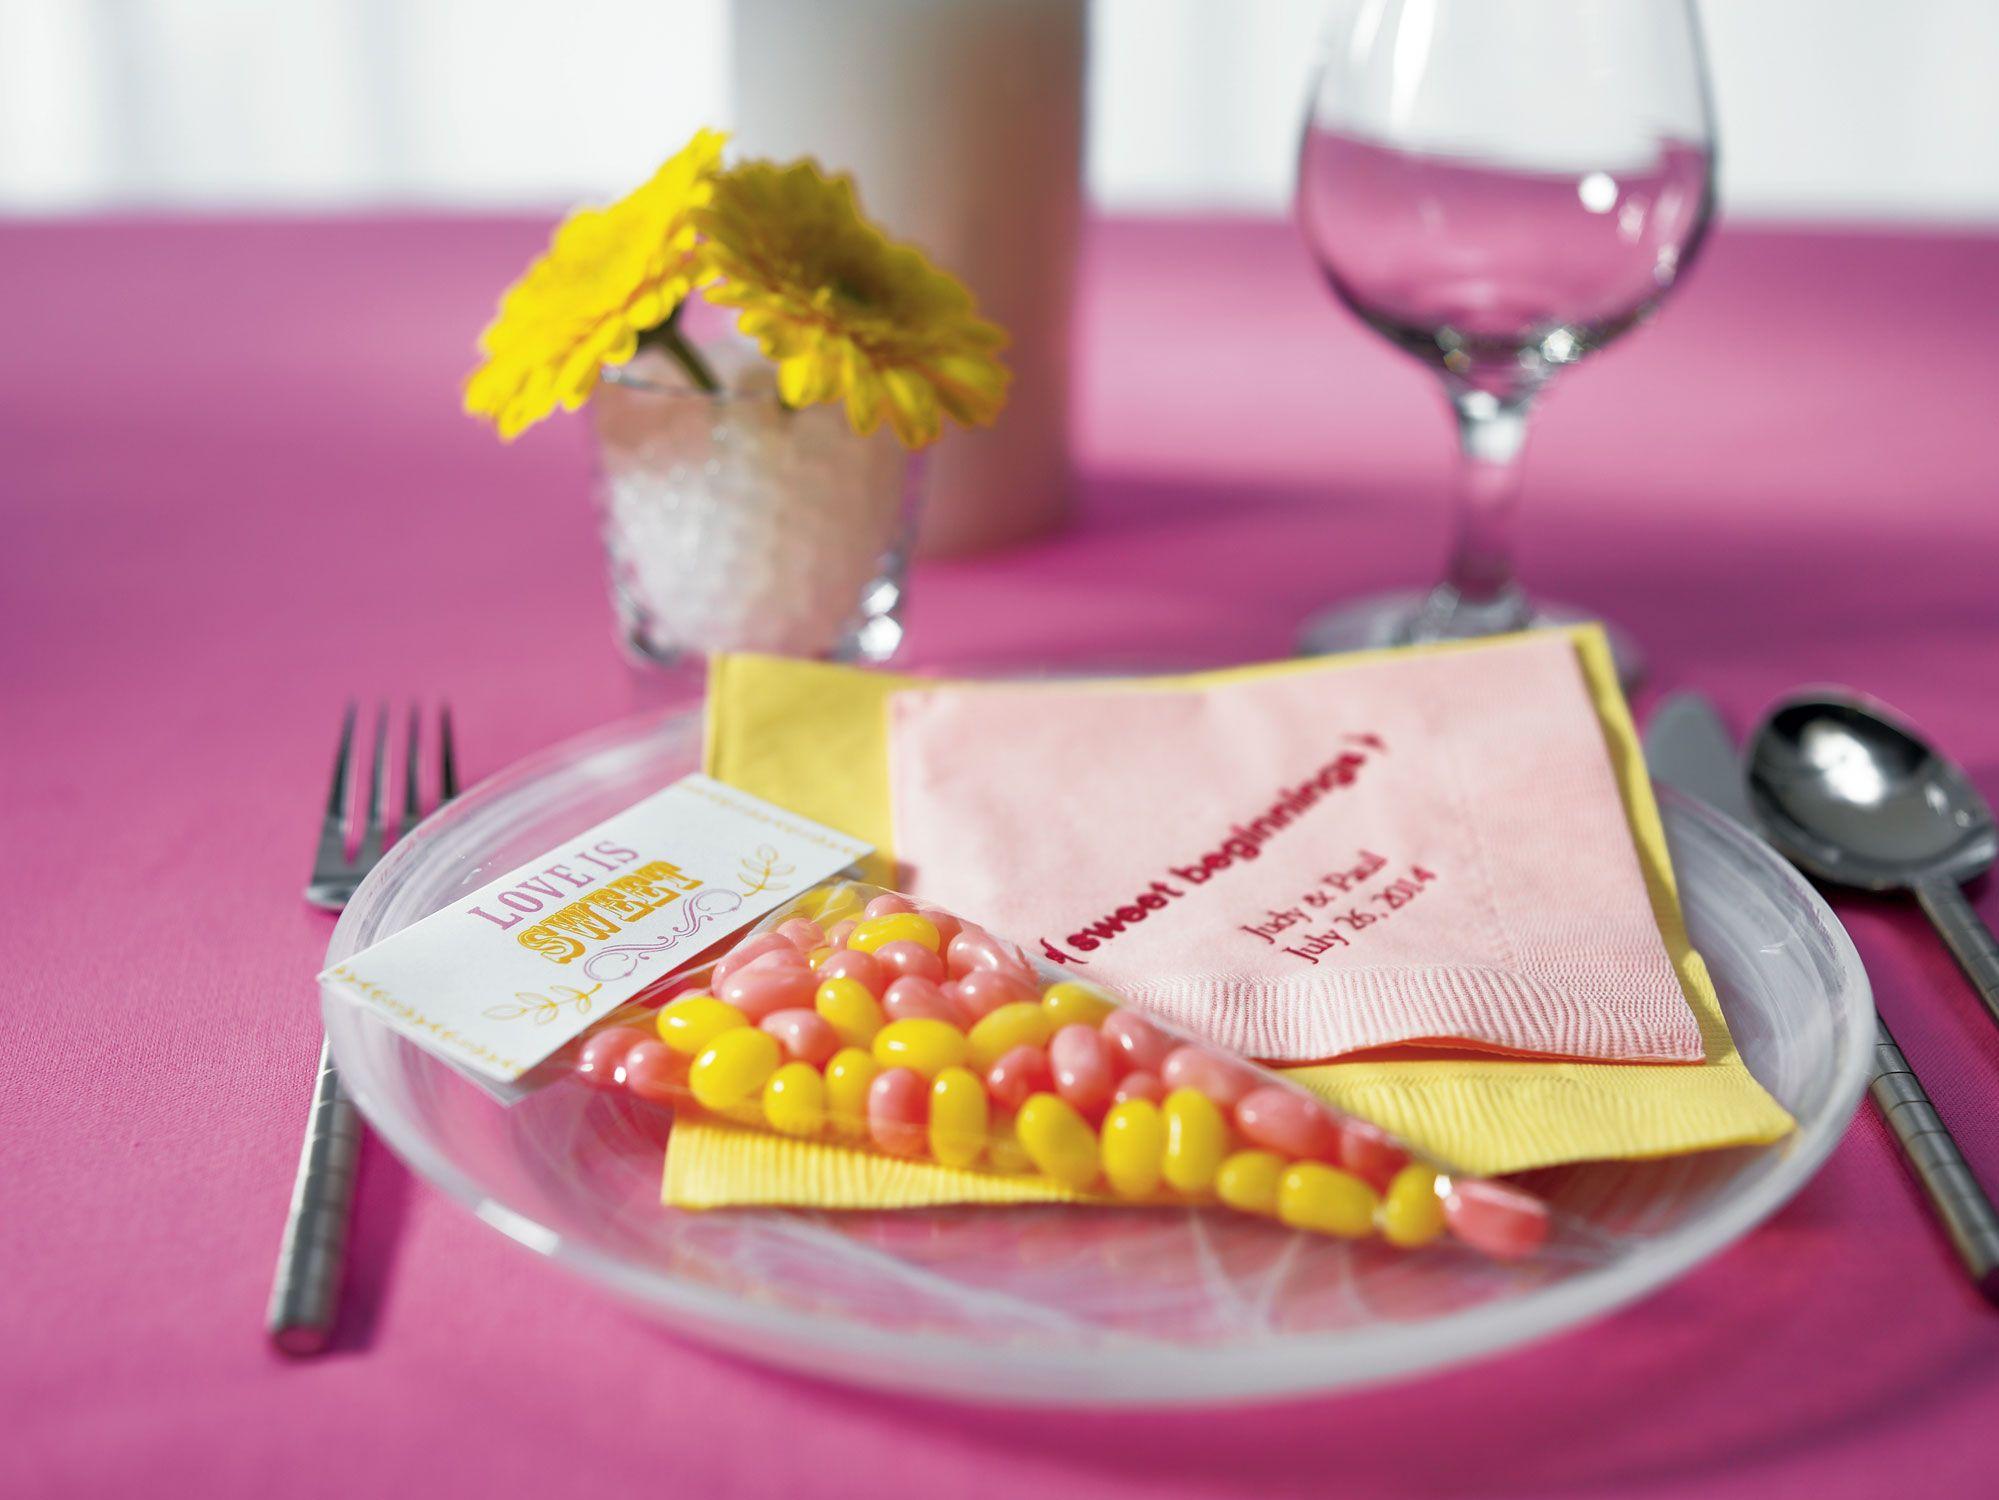 Wedding Treats: Specialty Candy Station Ideas! - Blackbride.com ...